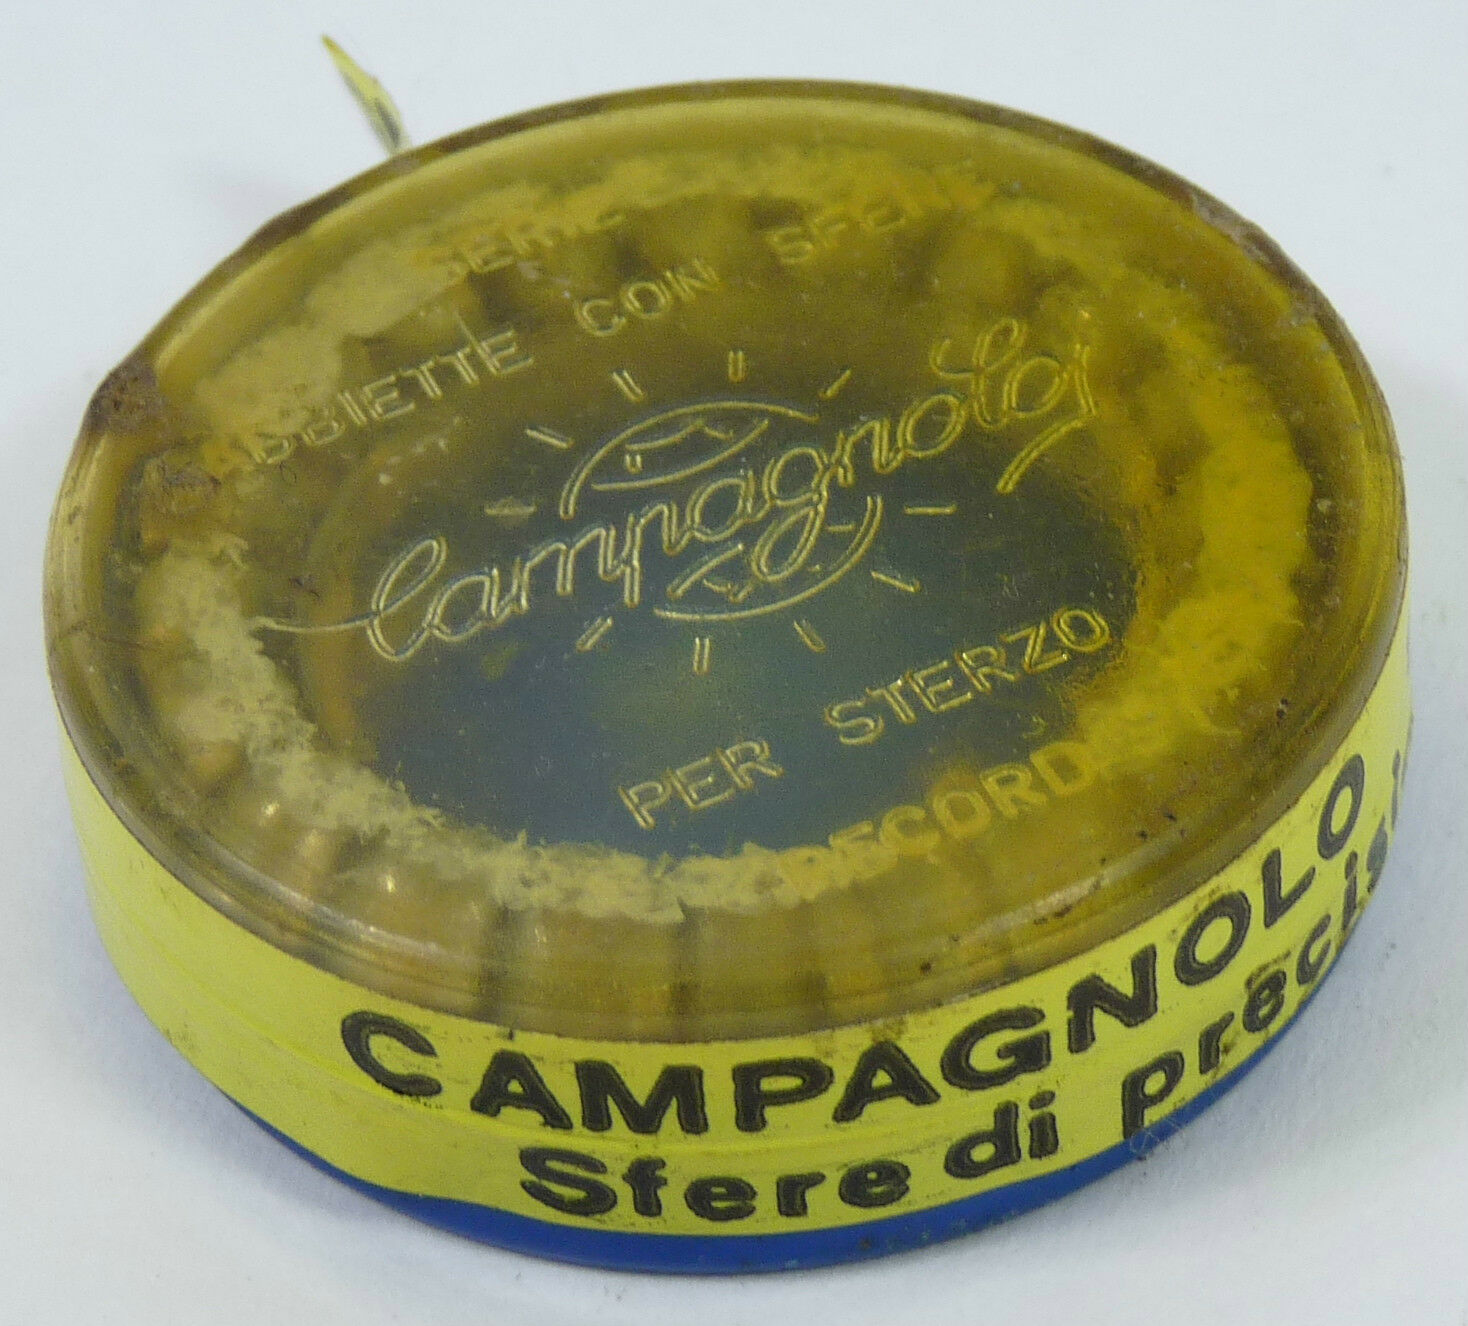 Campagnolo Record Headset Bearings   20 X 3 16  Ball Bearings Vintage 1  NOS  good reputation